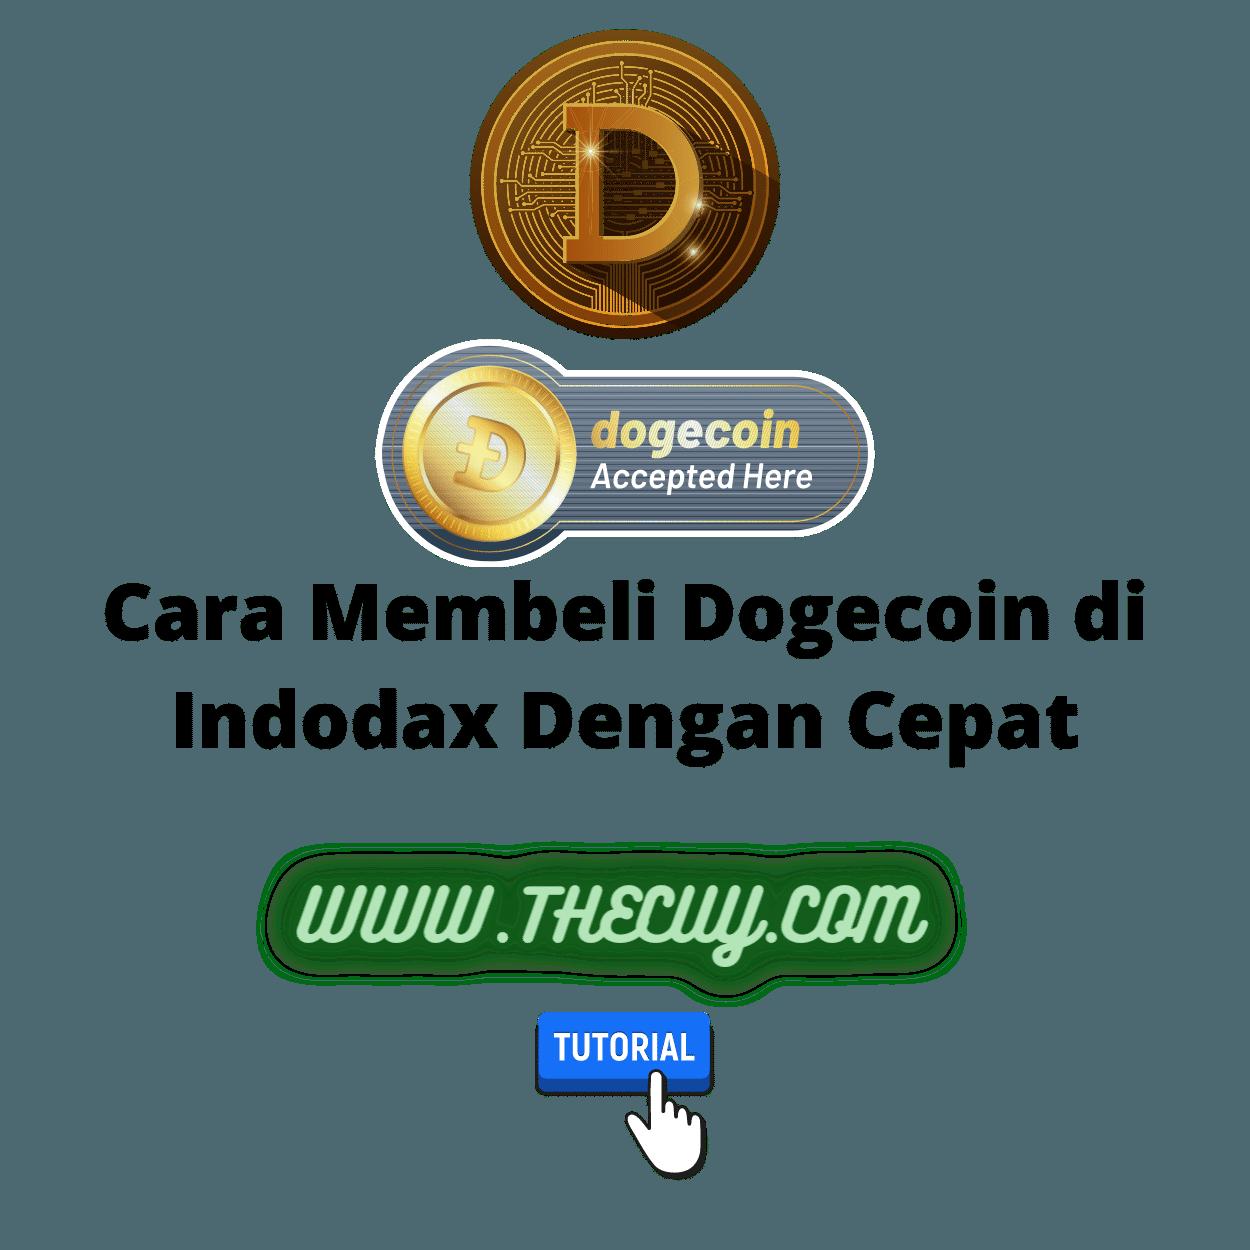 Cara Membeli Dogecoin di Indodax Dengan Cepat